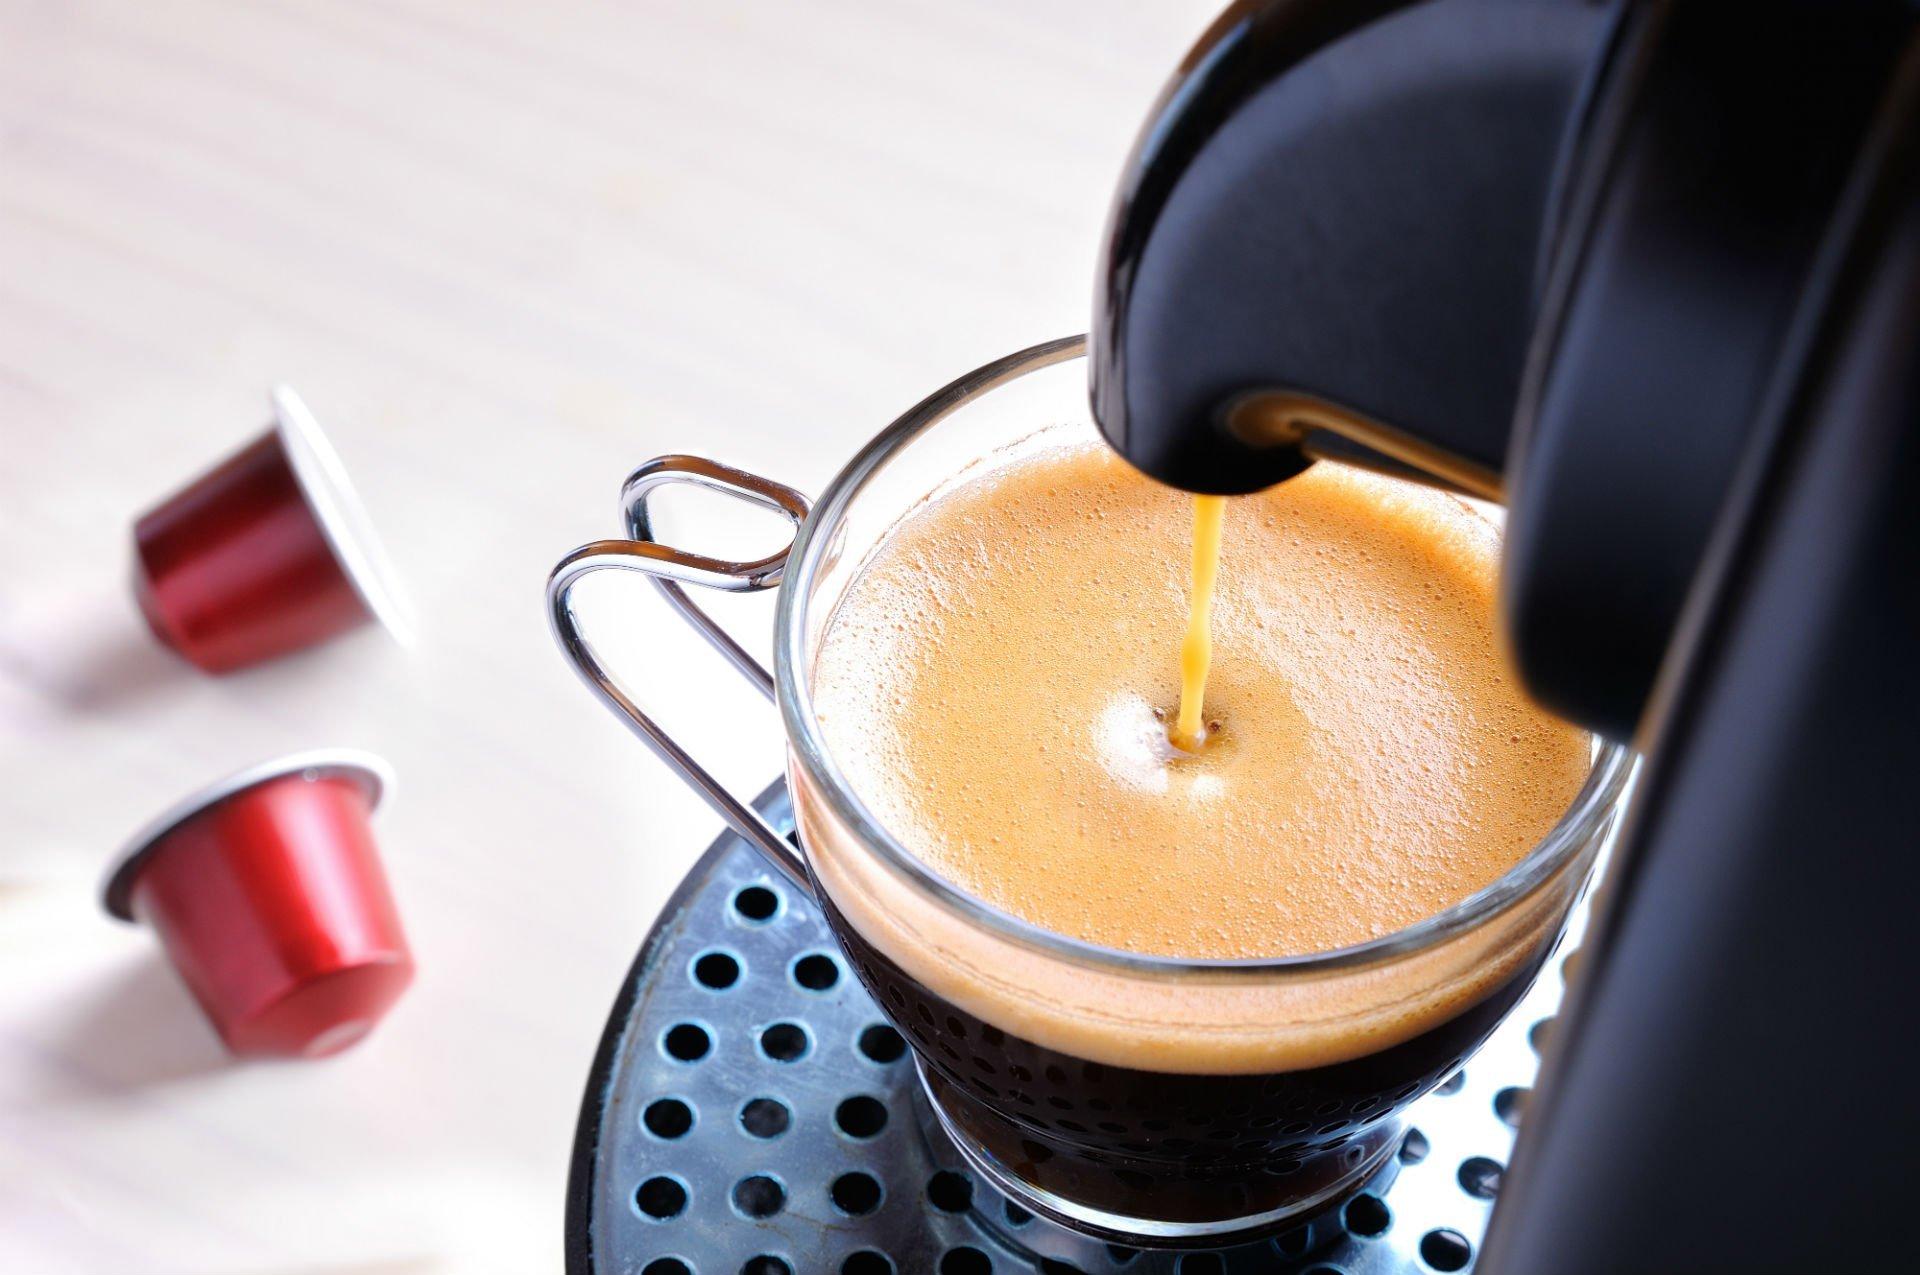 una tazza di caffè' sotto una macchina